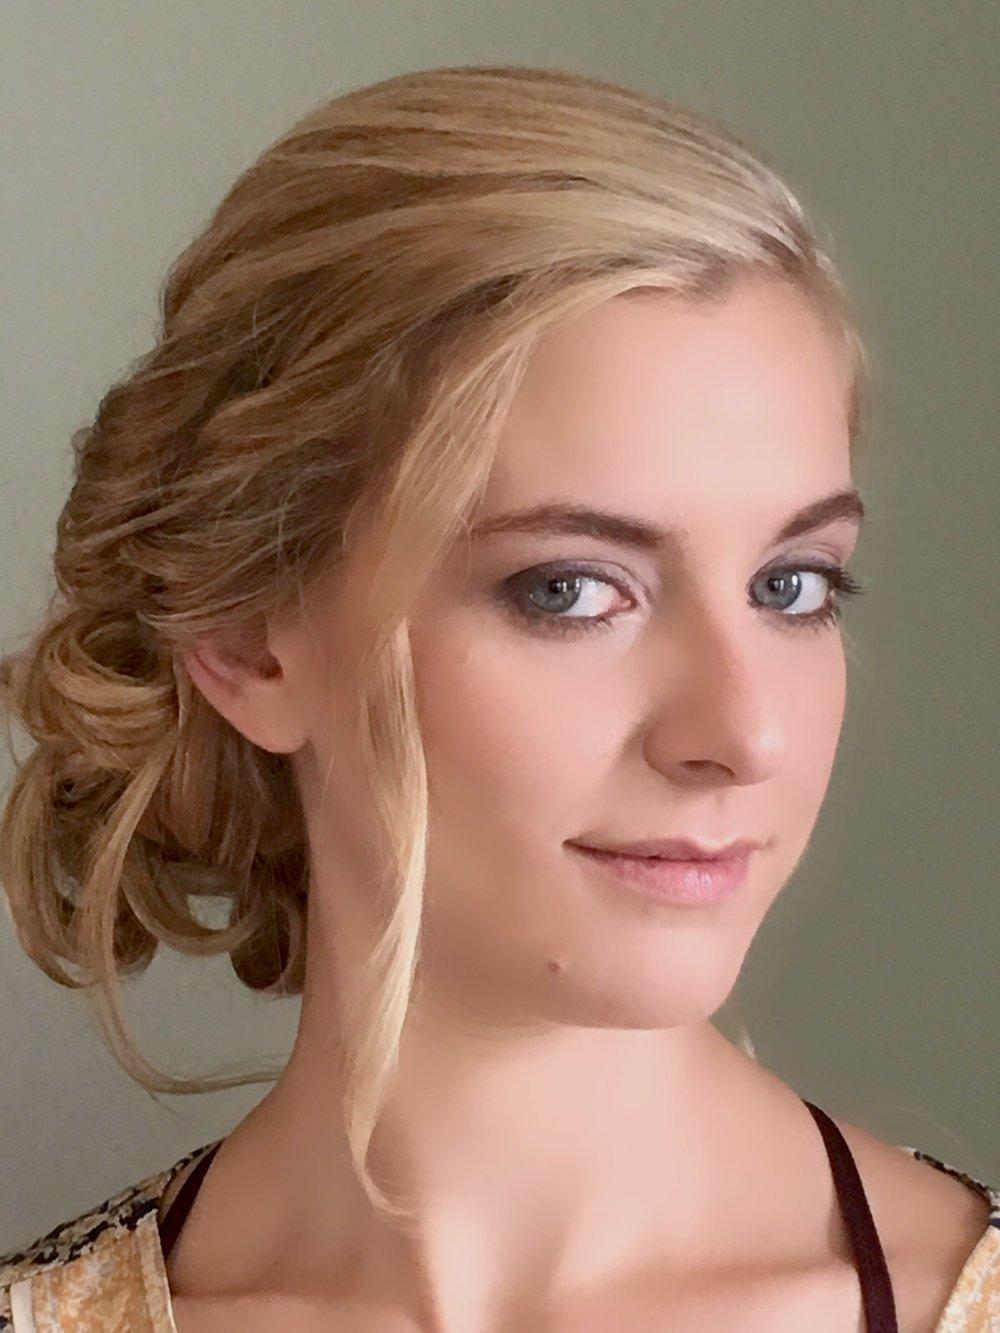 makeup_artists_hudsonny.jpg